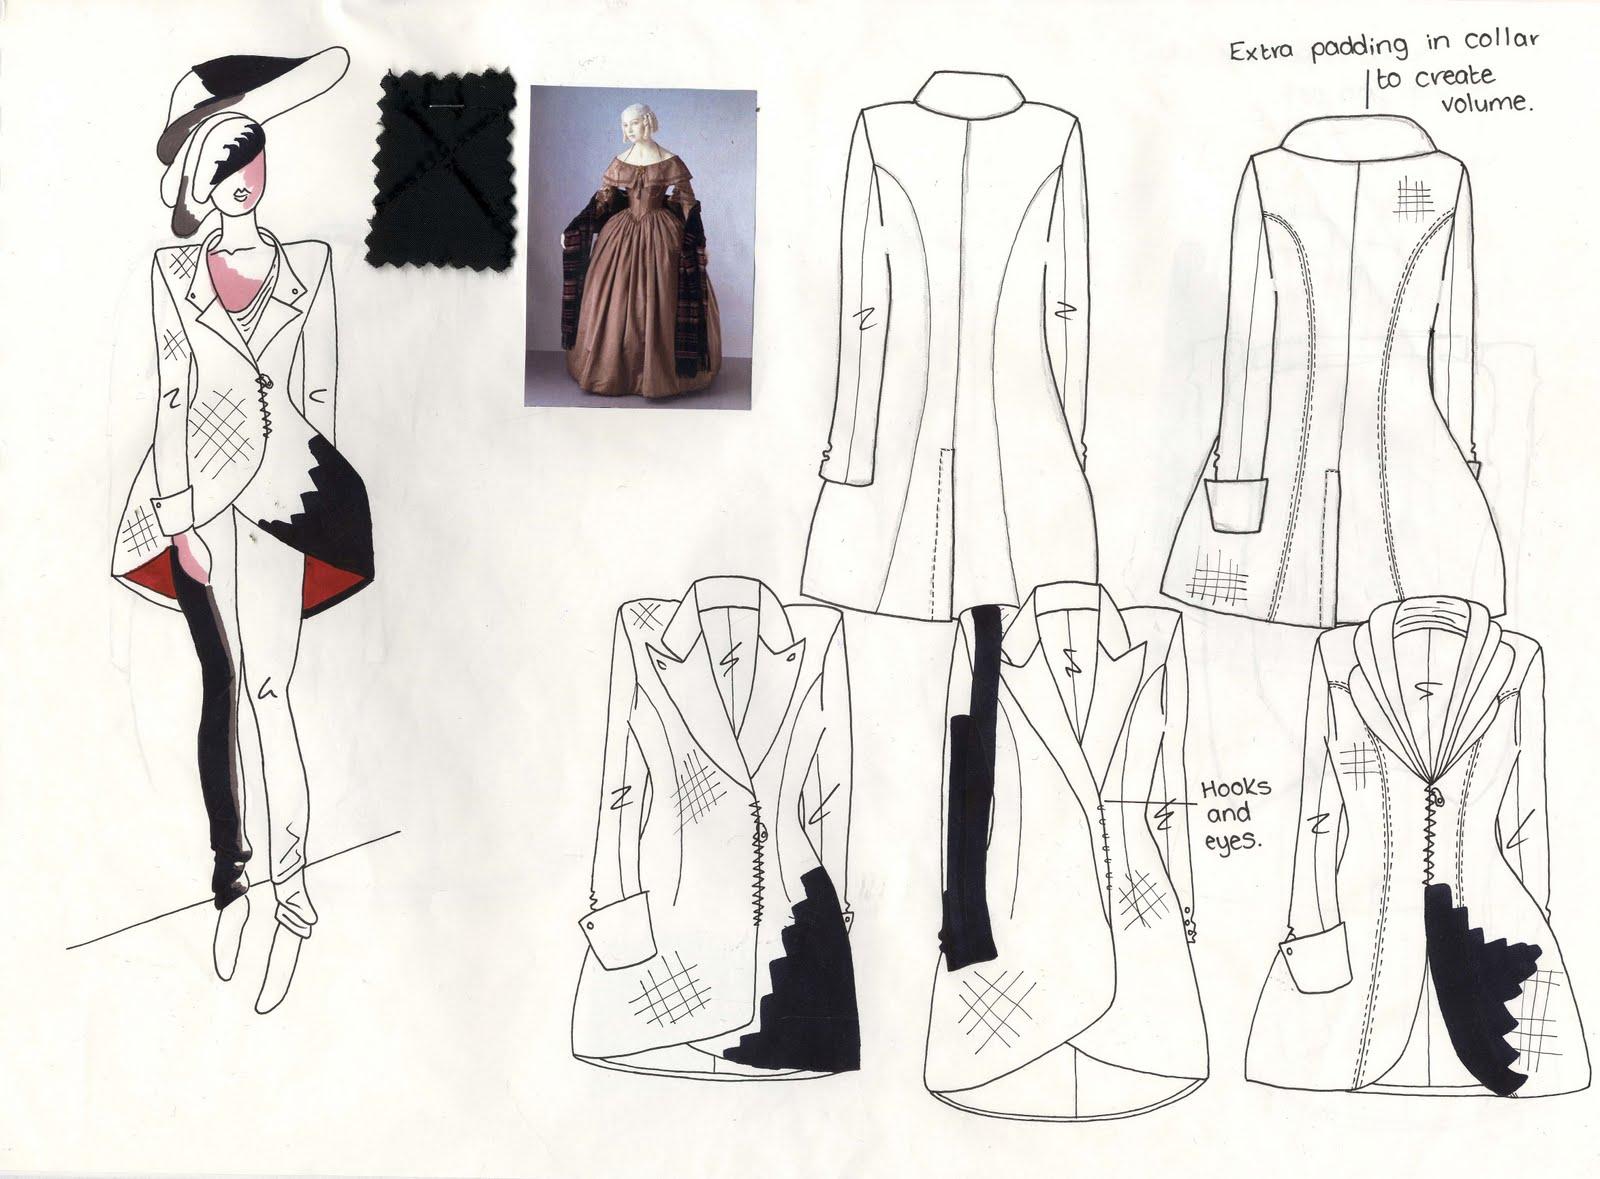 [Design+Development+1.+Josie+Haslam+200414480+blog]